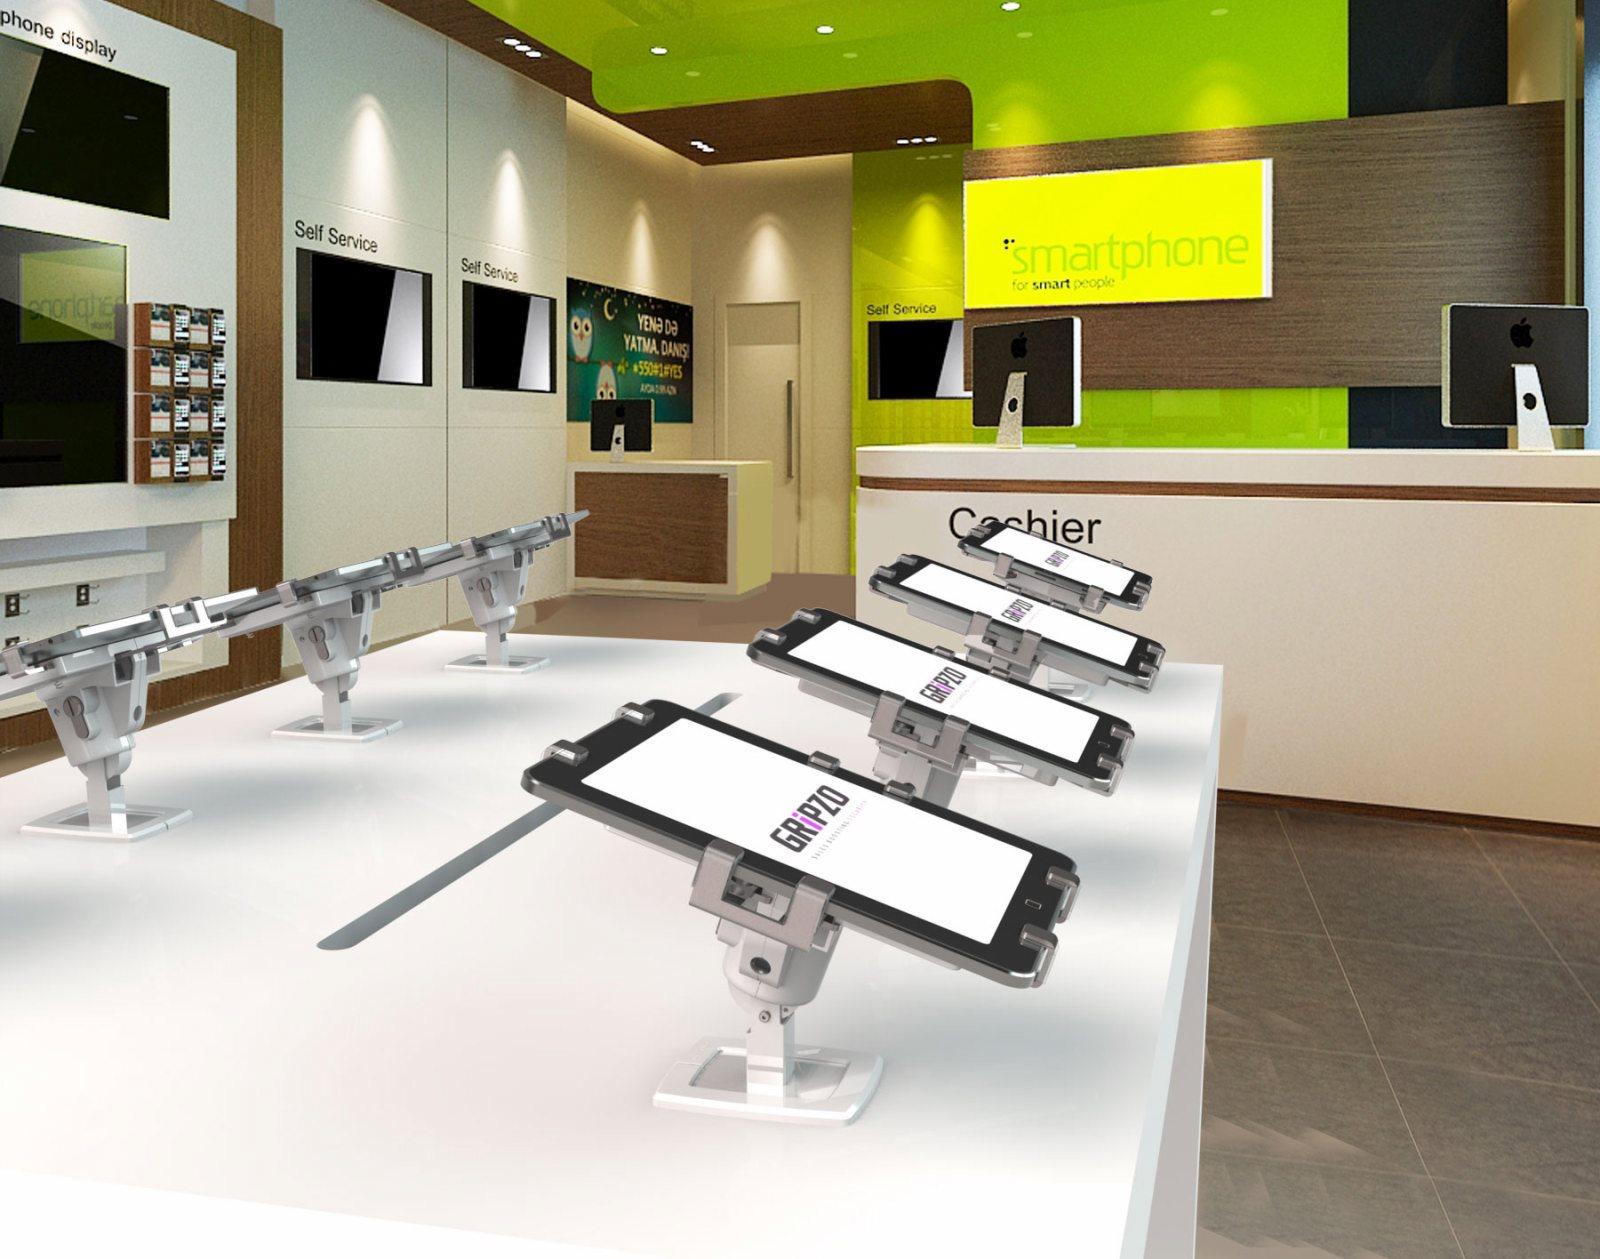 gripzo-tablet-grip-at-store-1.jpg